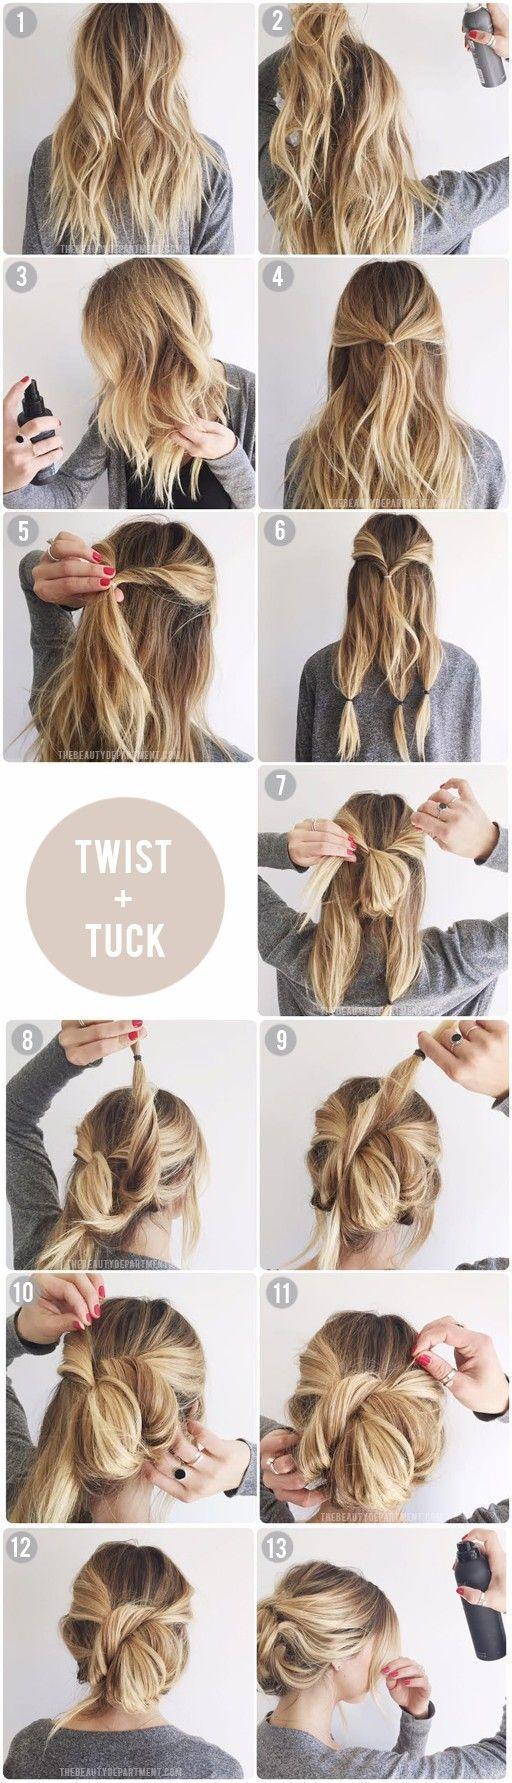 Swell 1000 Ideas About Easy Updo Tutorial On Pinterest Updo Tutorial Short Hairstyles For Black Women Fulllsitofus